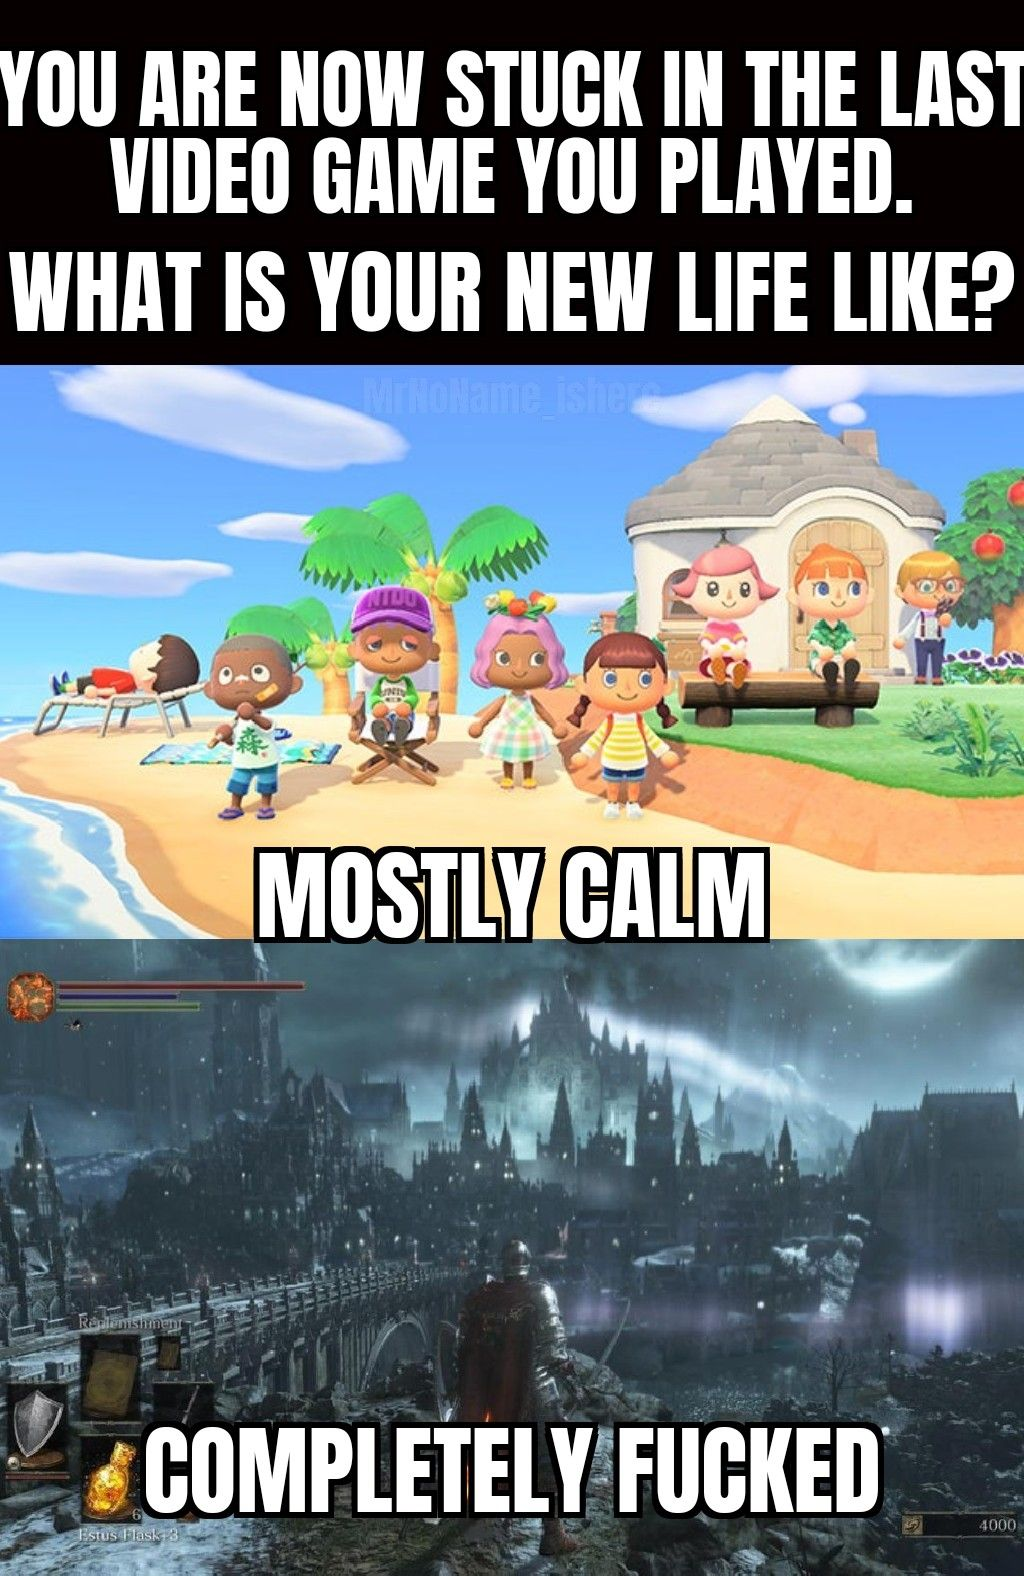 Dark Souls players are screwed